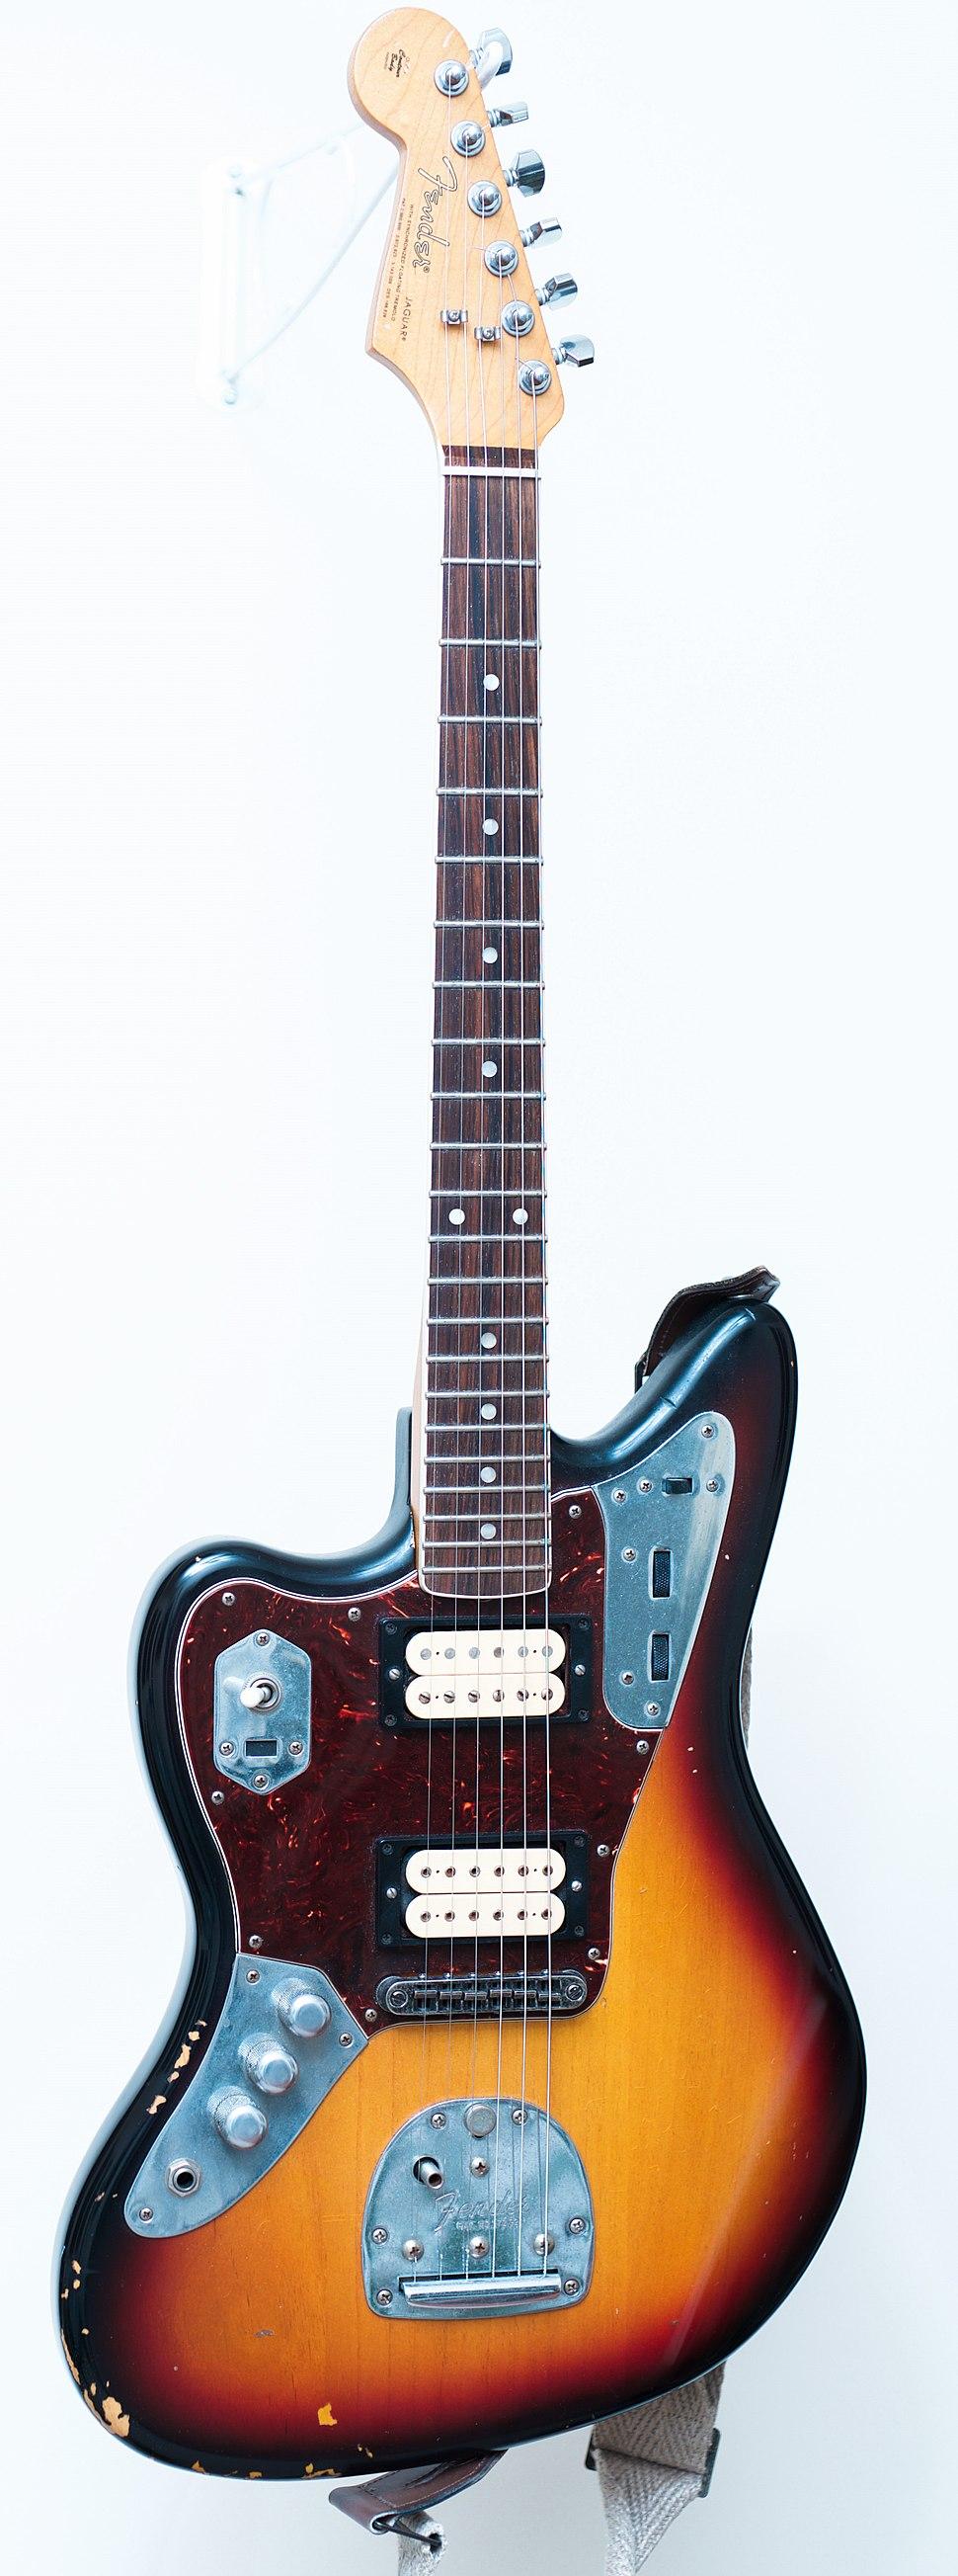 Fender Jaguar II